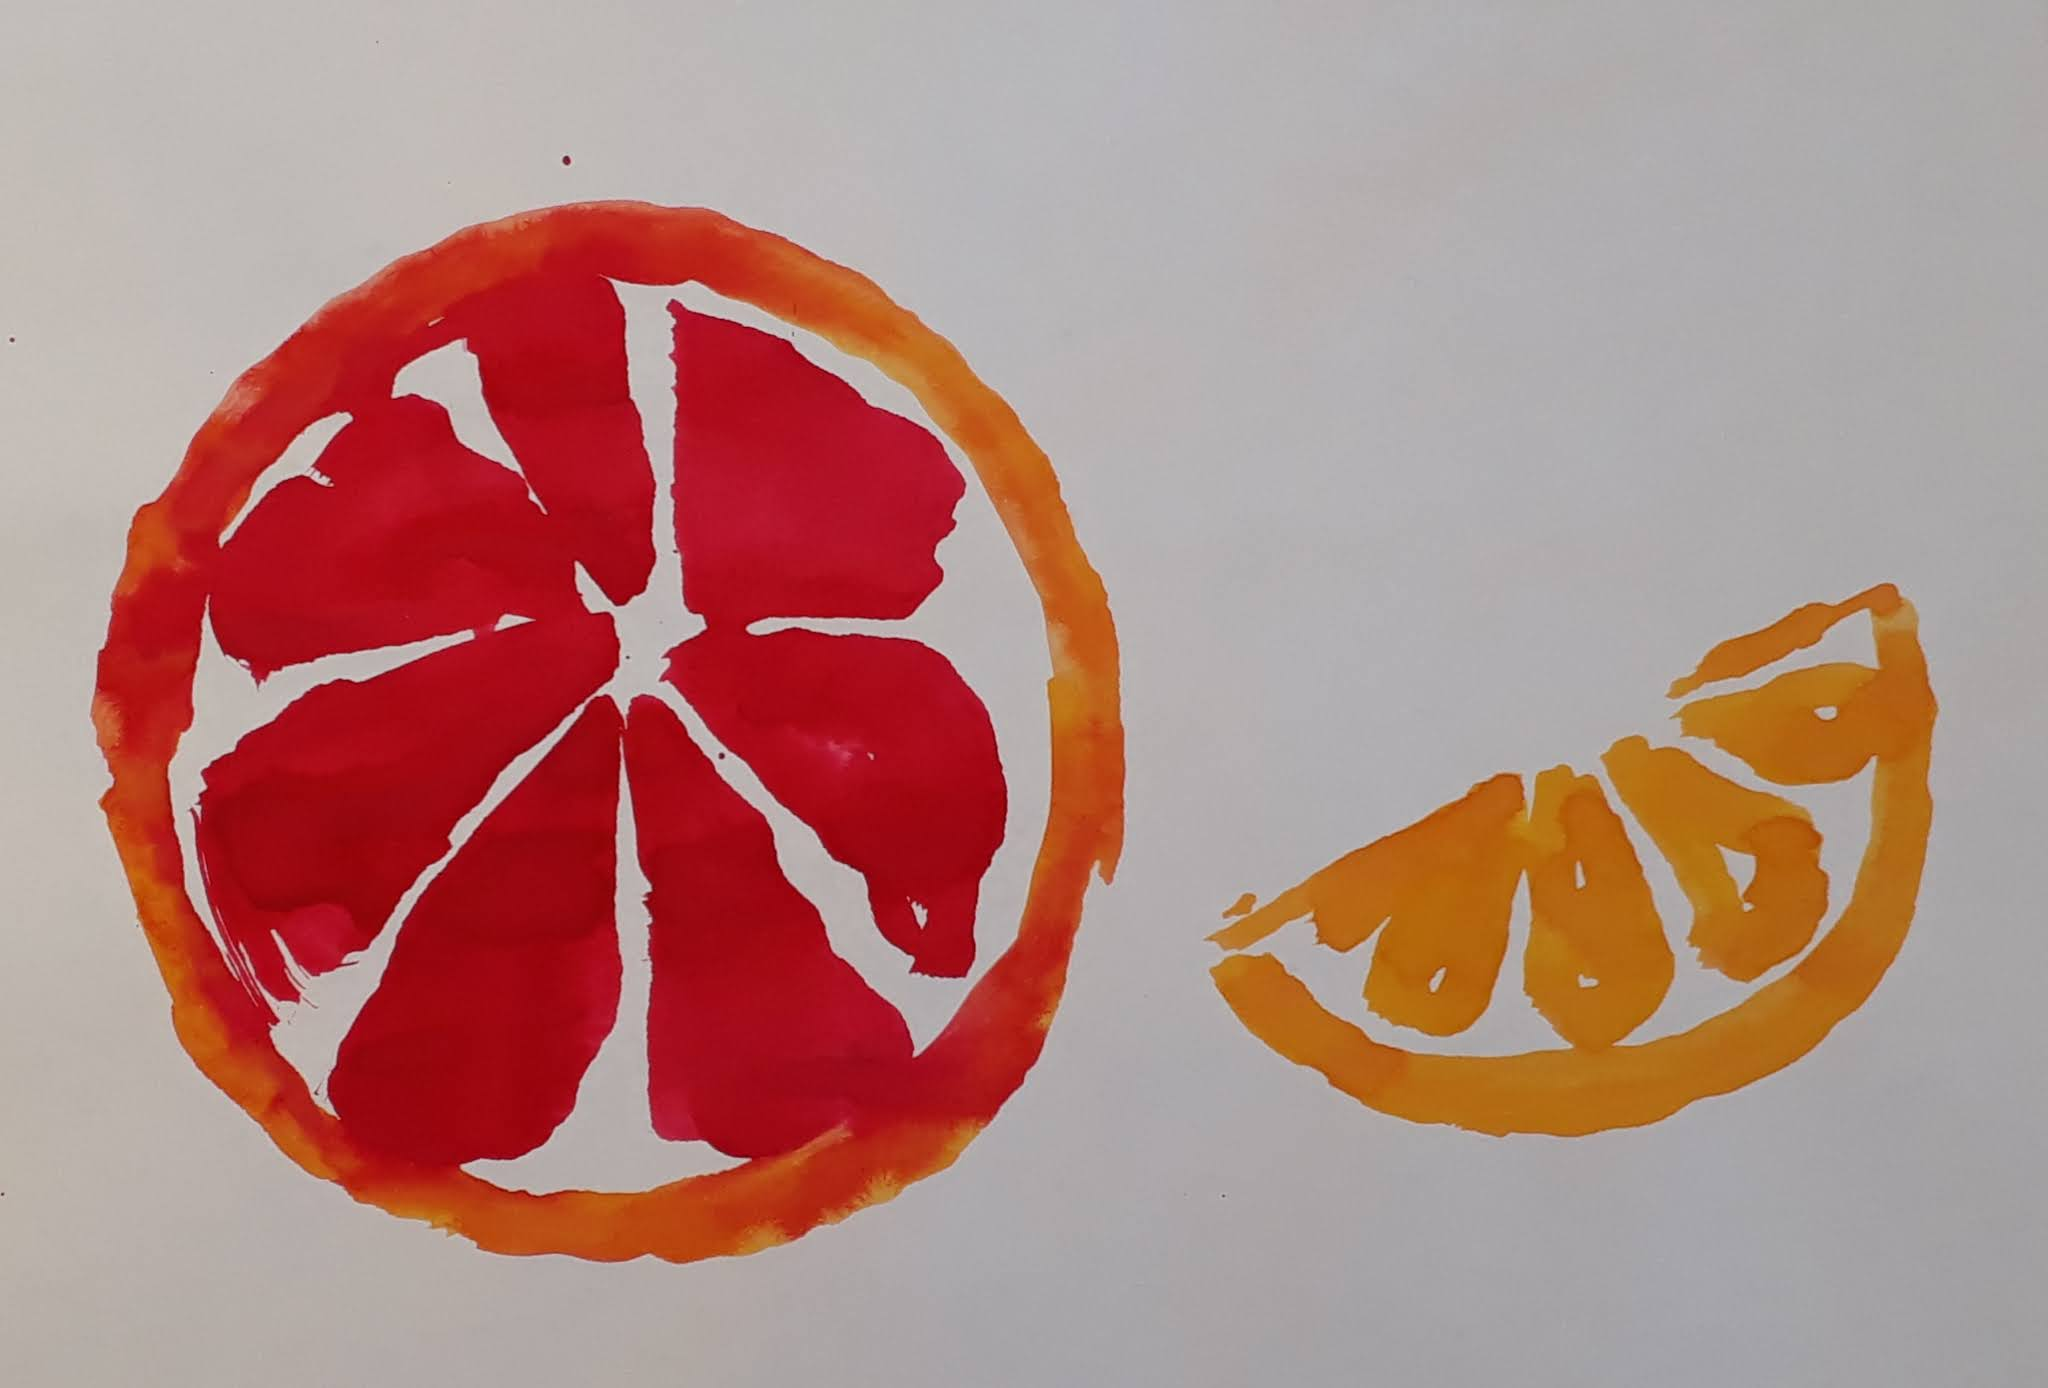 Greippi ja appelsiinilohko vesivärimaalaus